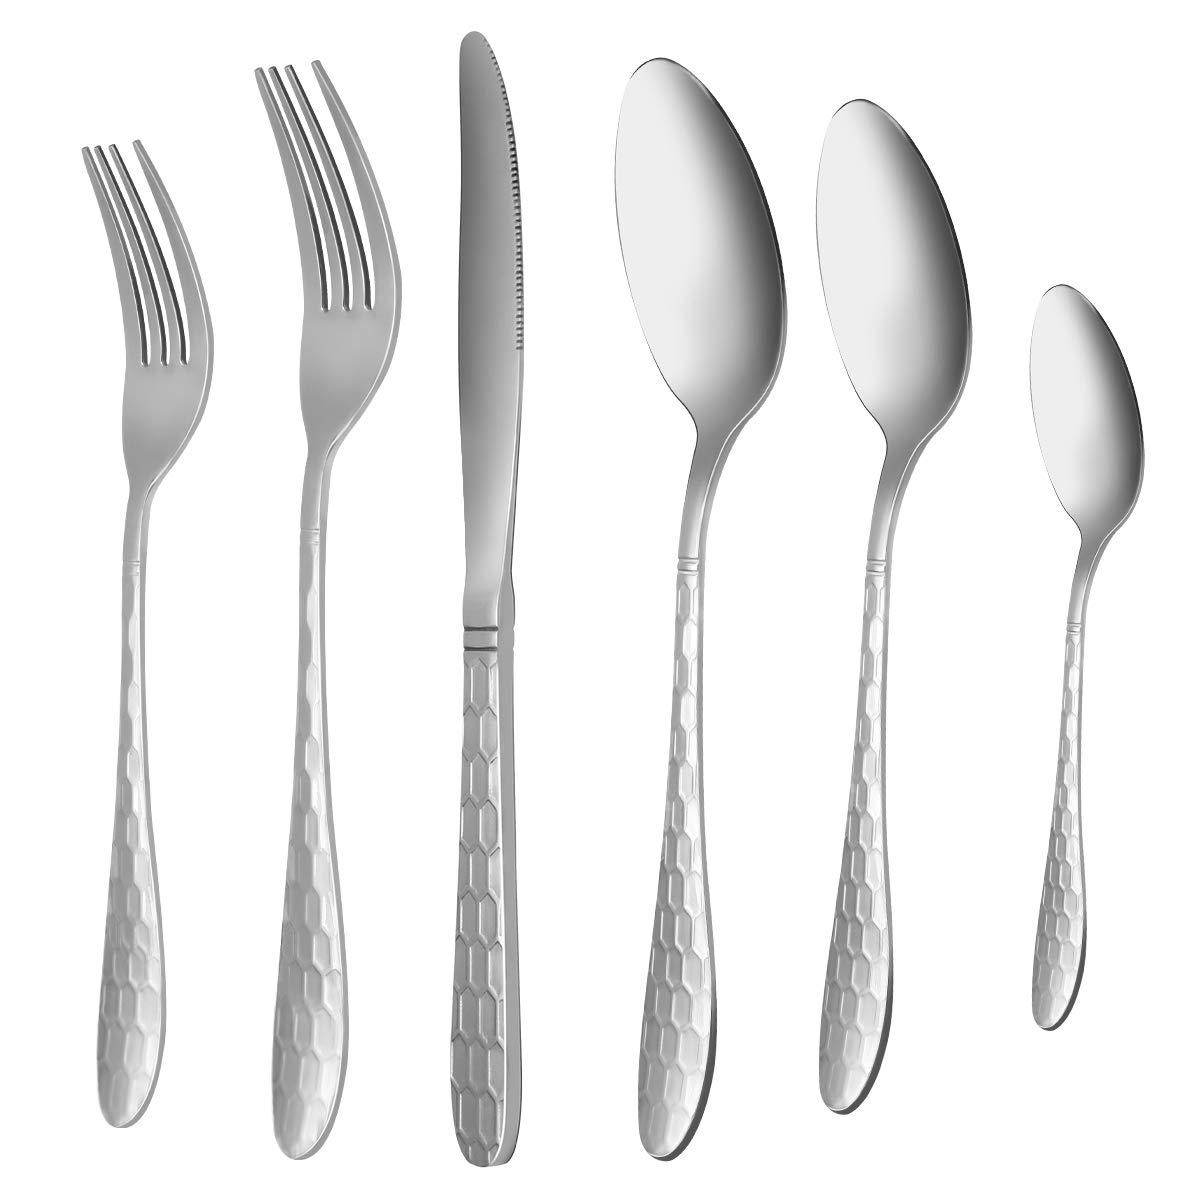 Silverware Flatware Cutlery Set, VERONES 24-Piece Stainless Steel Utensils Service for 4, Fit For Home Kitchen Hotel Restaurant Tableware Cutlery Set, Mirror Finished, Dishwasher Safe.